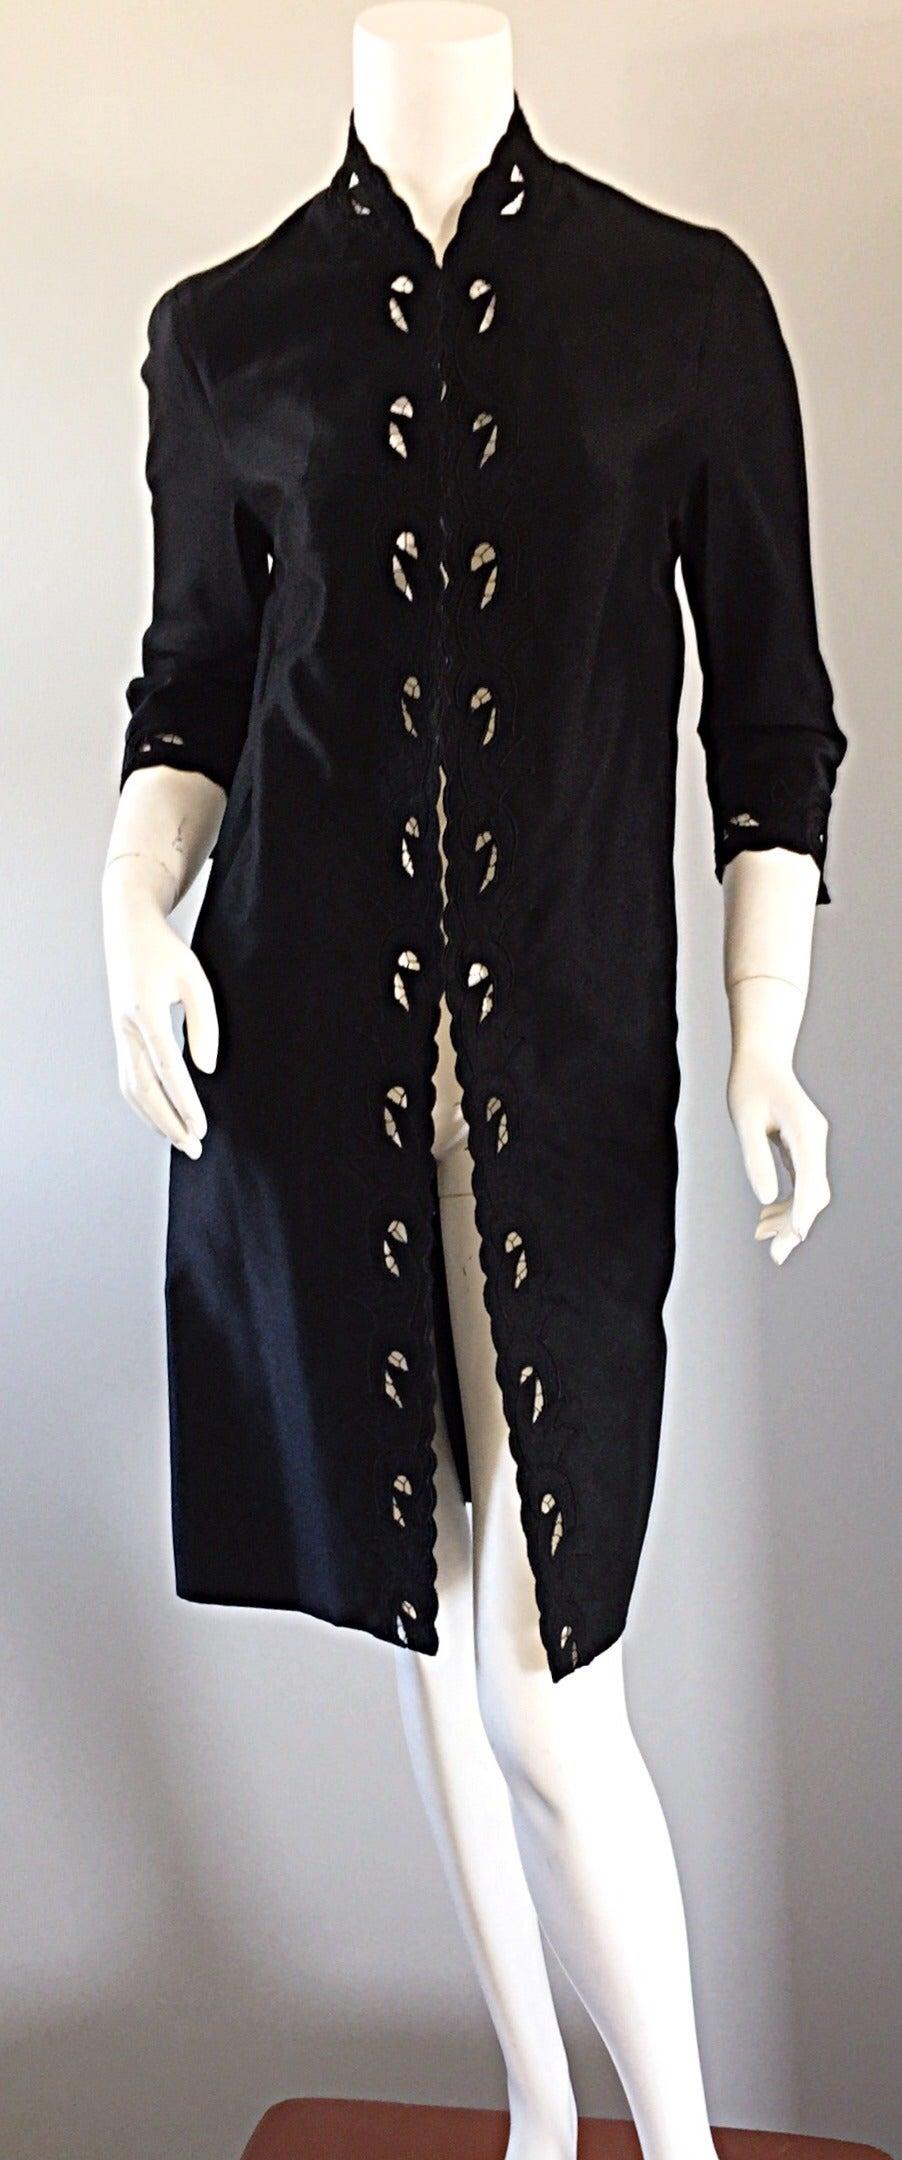 Chic 1940s Black Duster / Opera Jacket w/ Crochet Details + Scalloped Edges 2